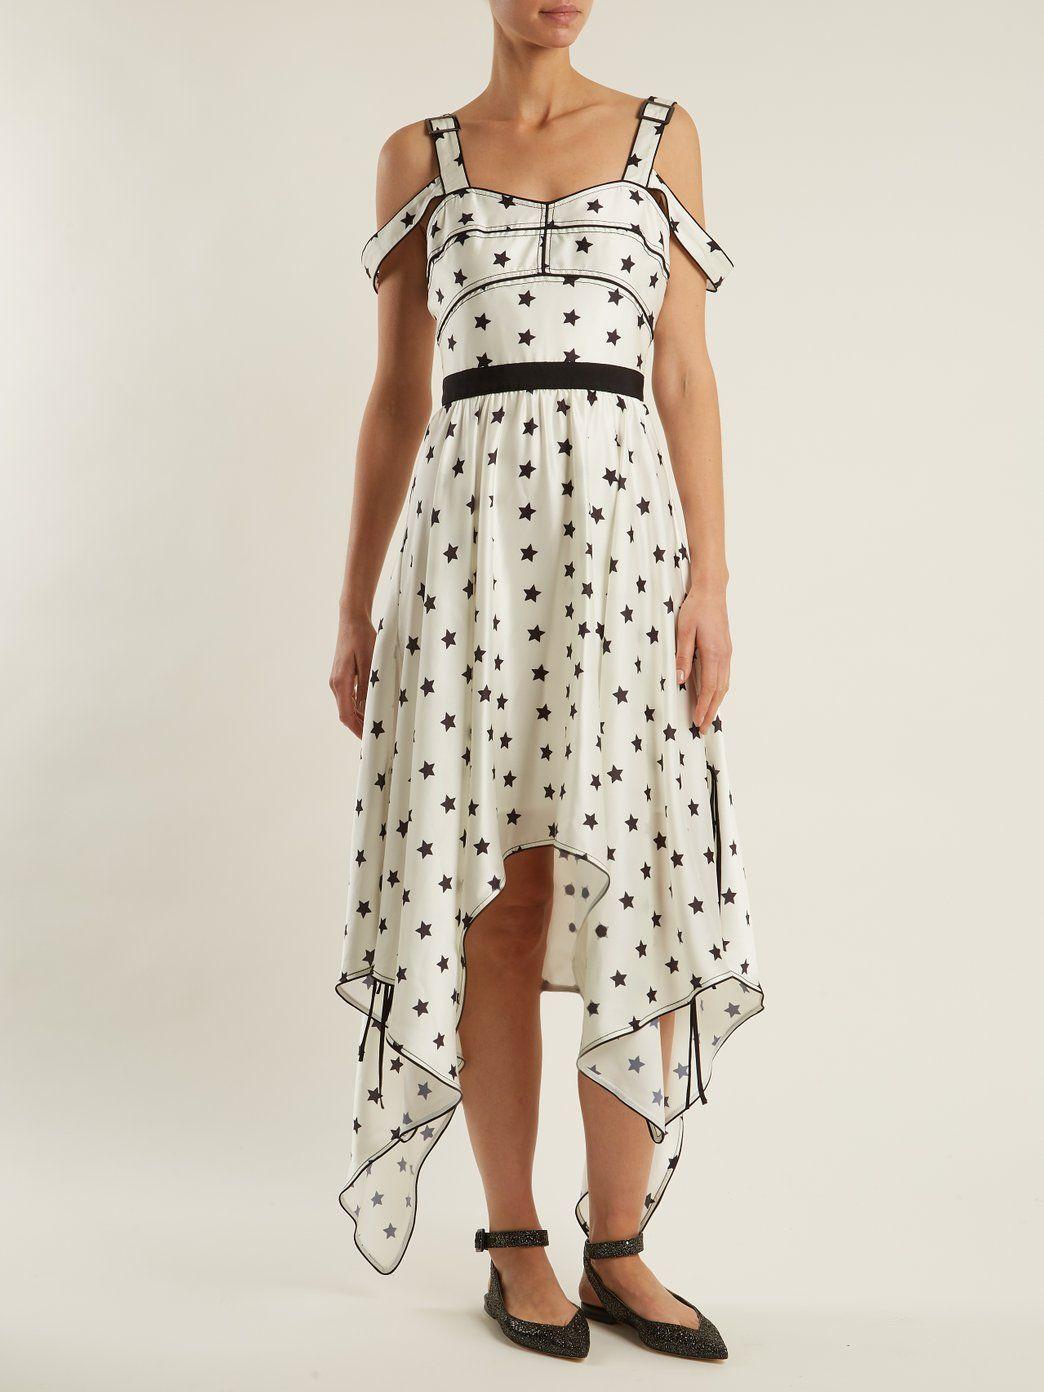 c409dc8255f5 Click here to buy Self-portrait Handkerchief-hem star-print satin dress at  MATCHESFASHION.COM